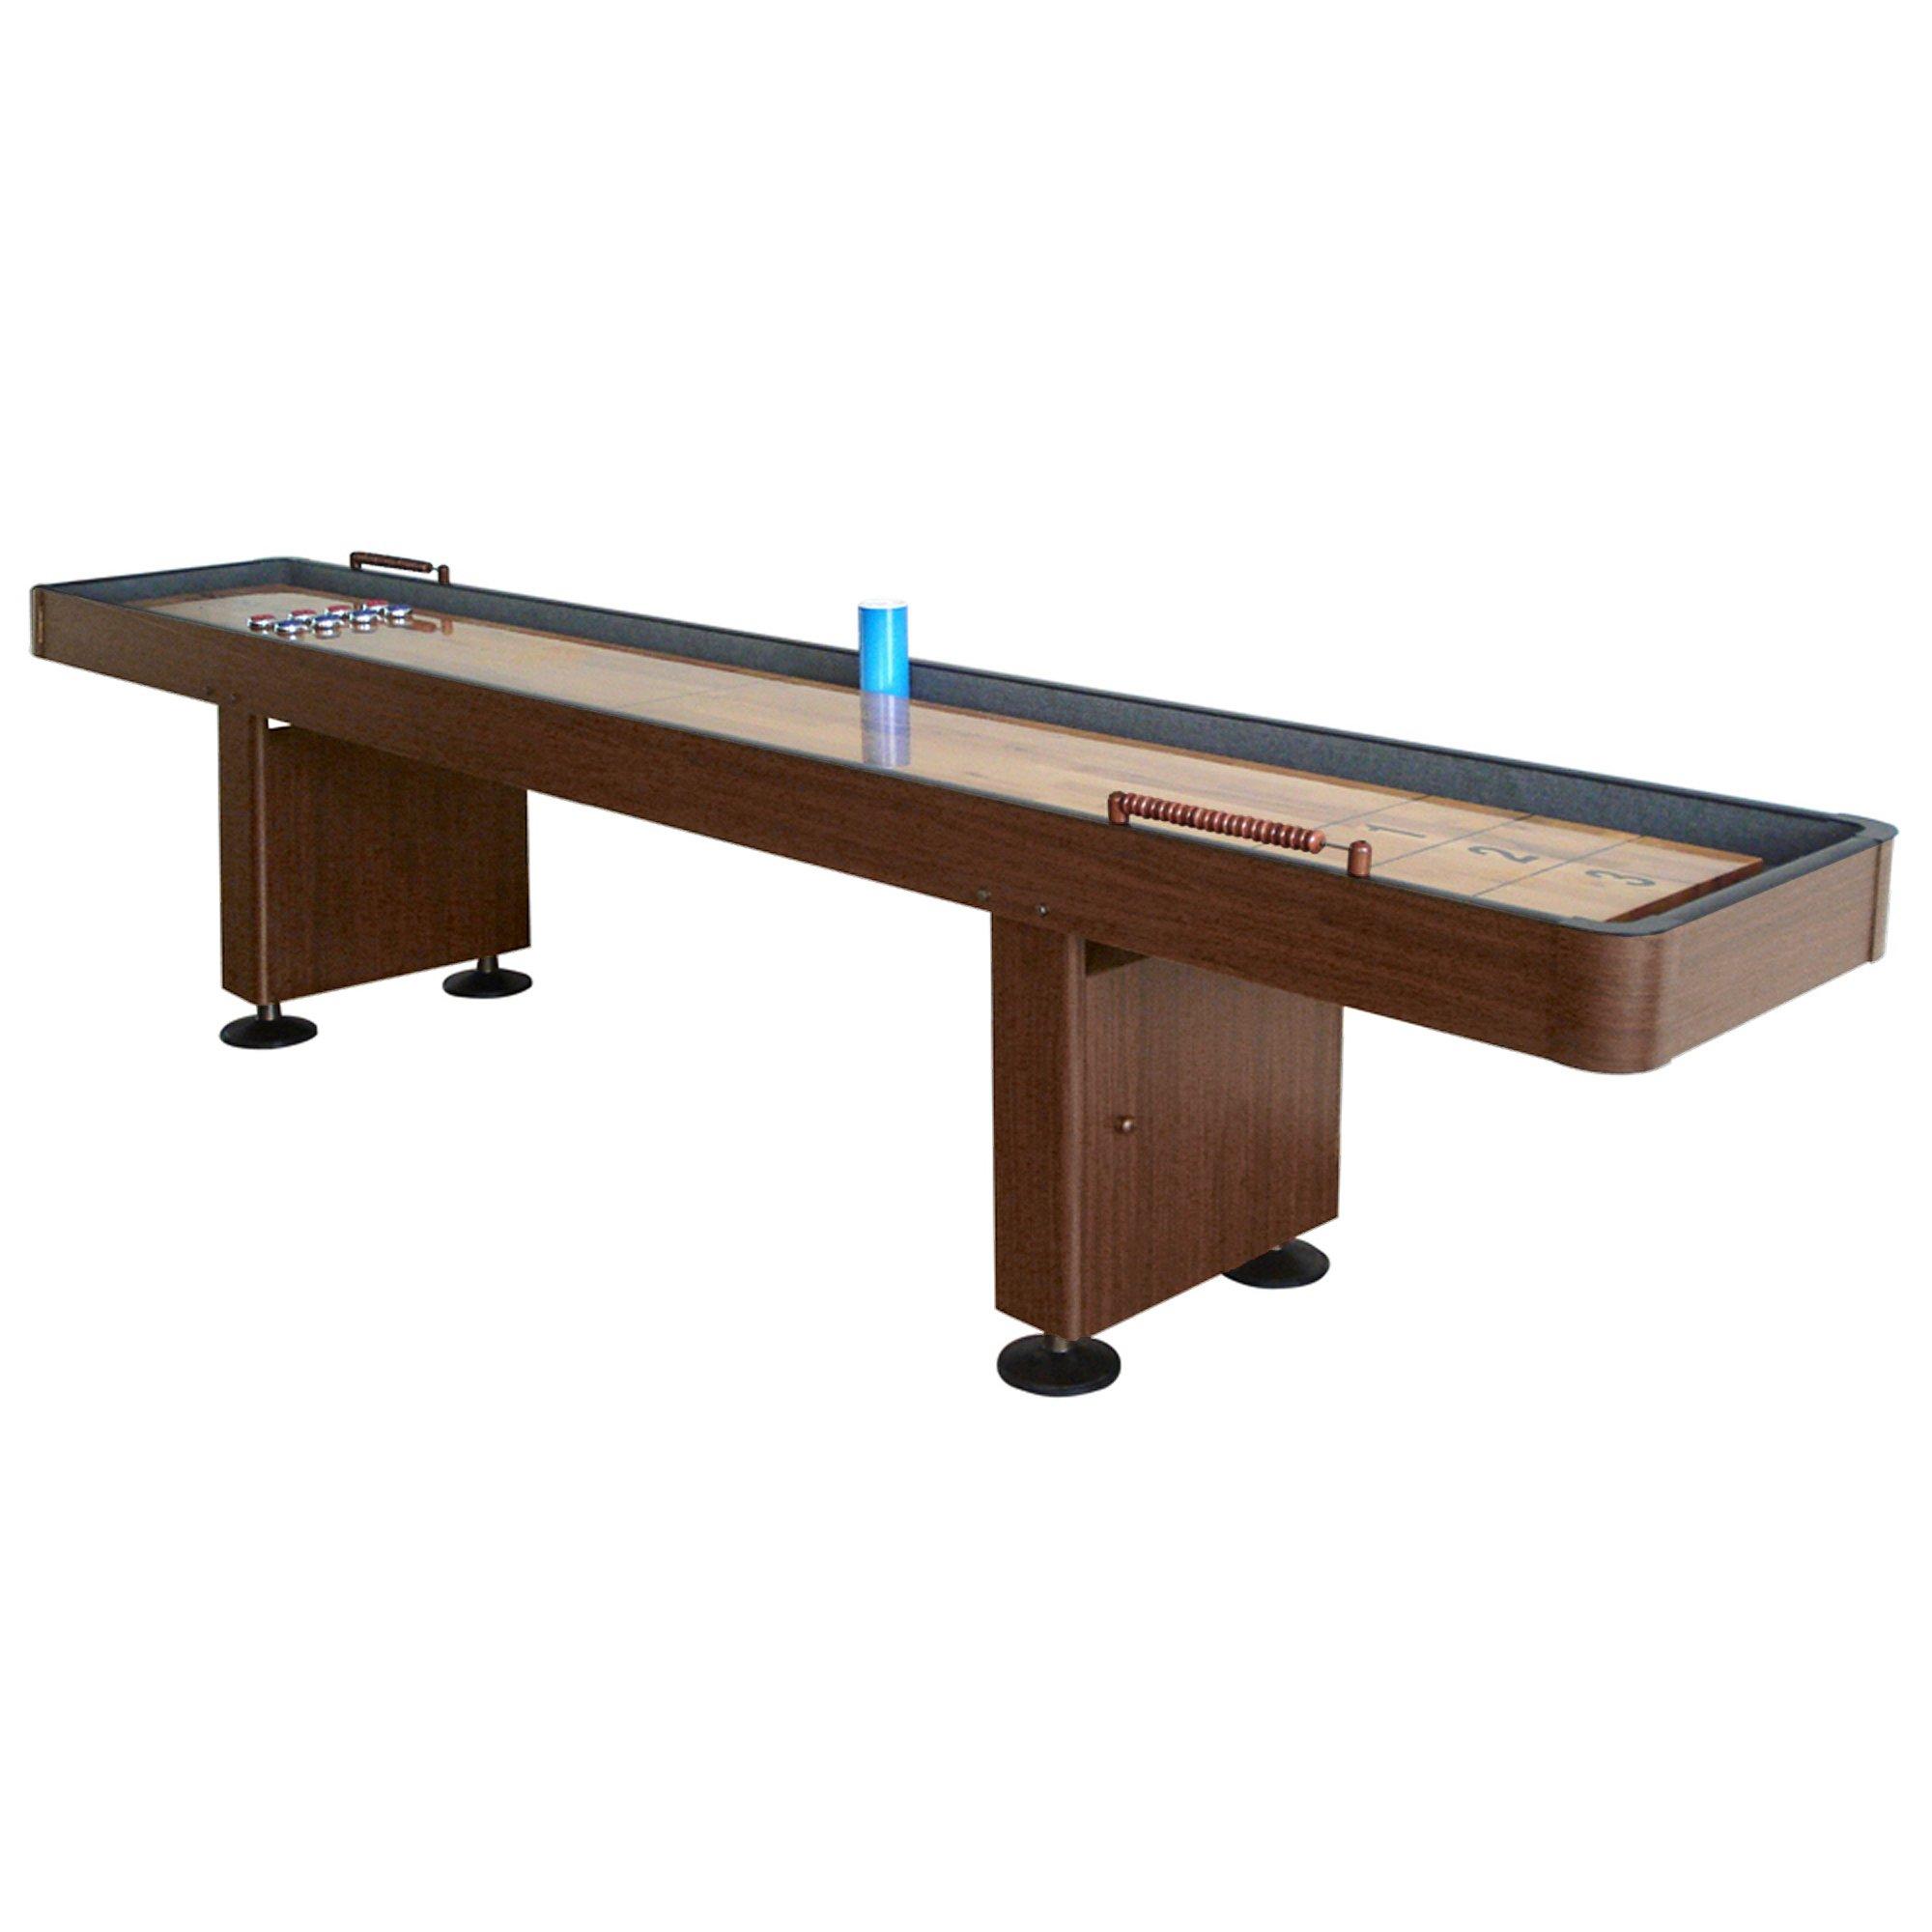 Hathaway BG1212 Challenger Shuffleboard Table w Walnut Finish, Hardwood Playfield, Storage Cabinets by Hathaway